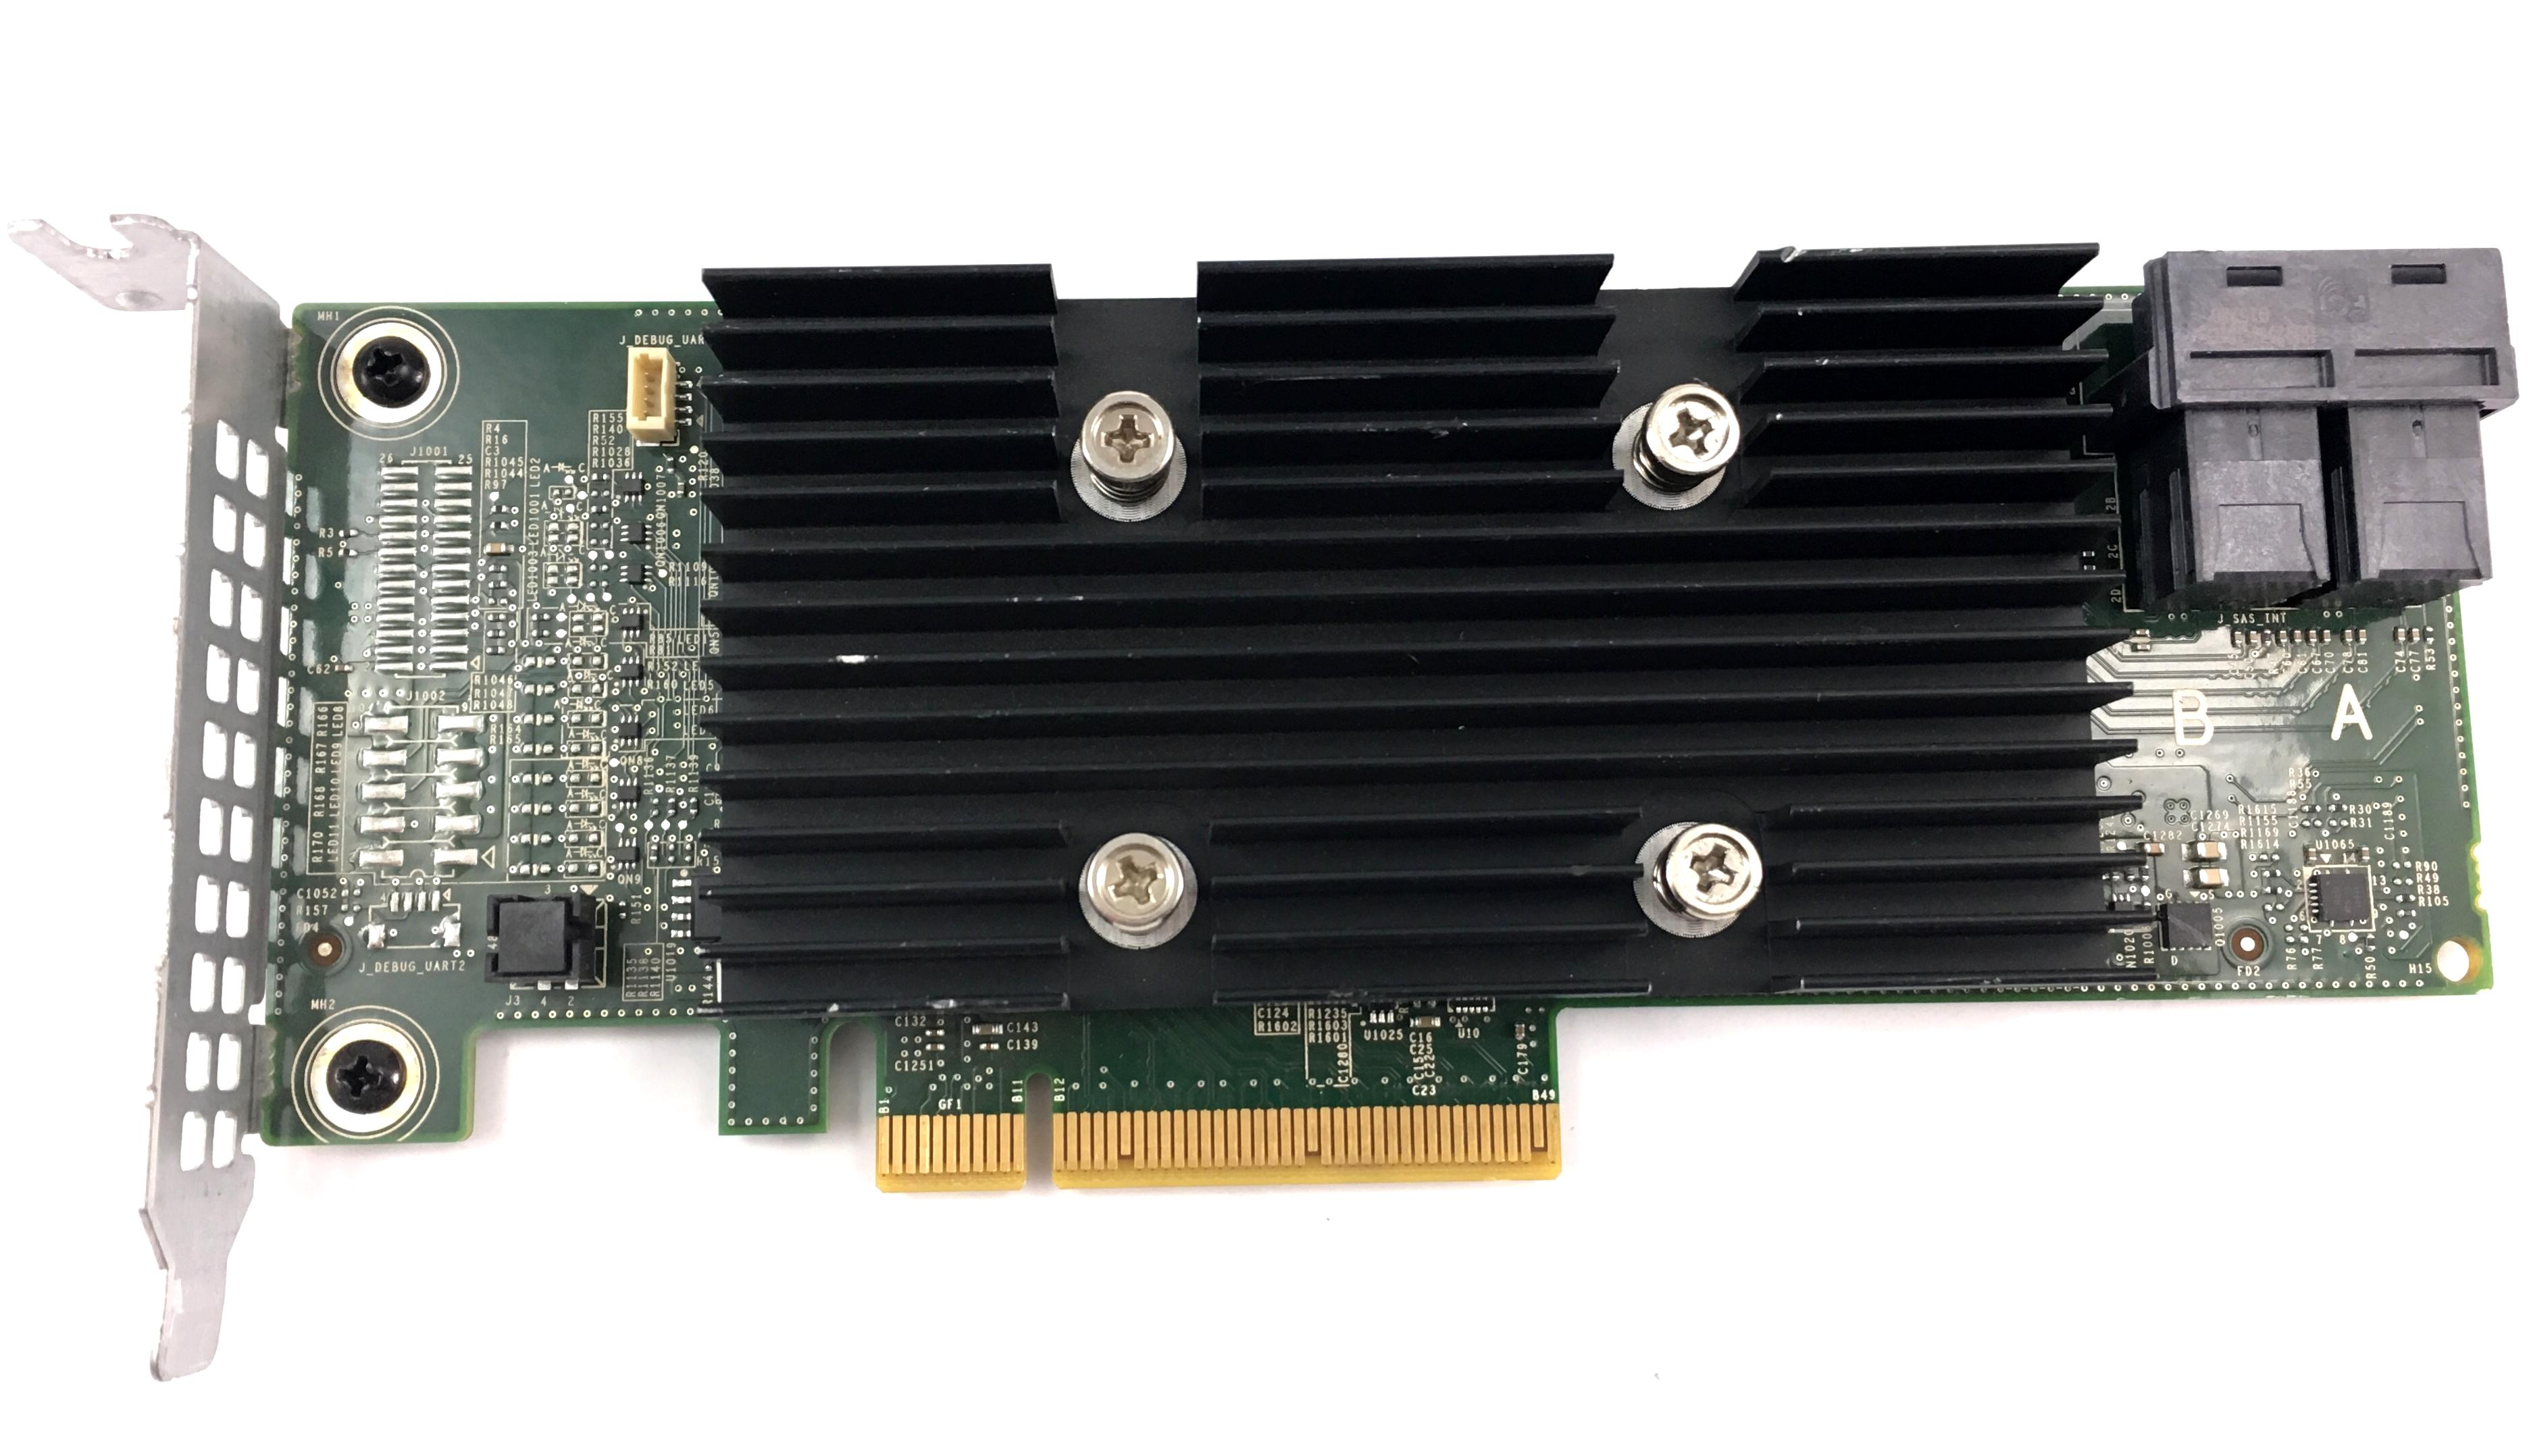 TCKPF Dell PERC H330 12G 12Gbps 8-Port SAS SATA PCIe x8 Raid Controller Card (TCKPF)